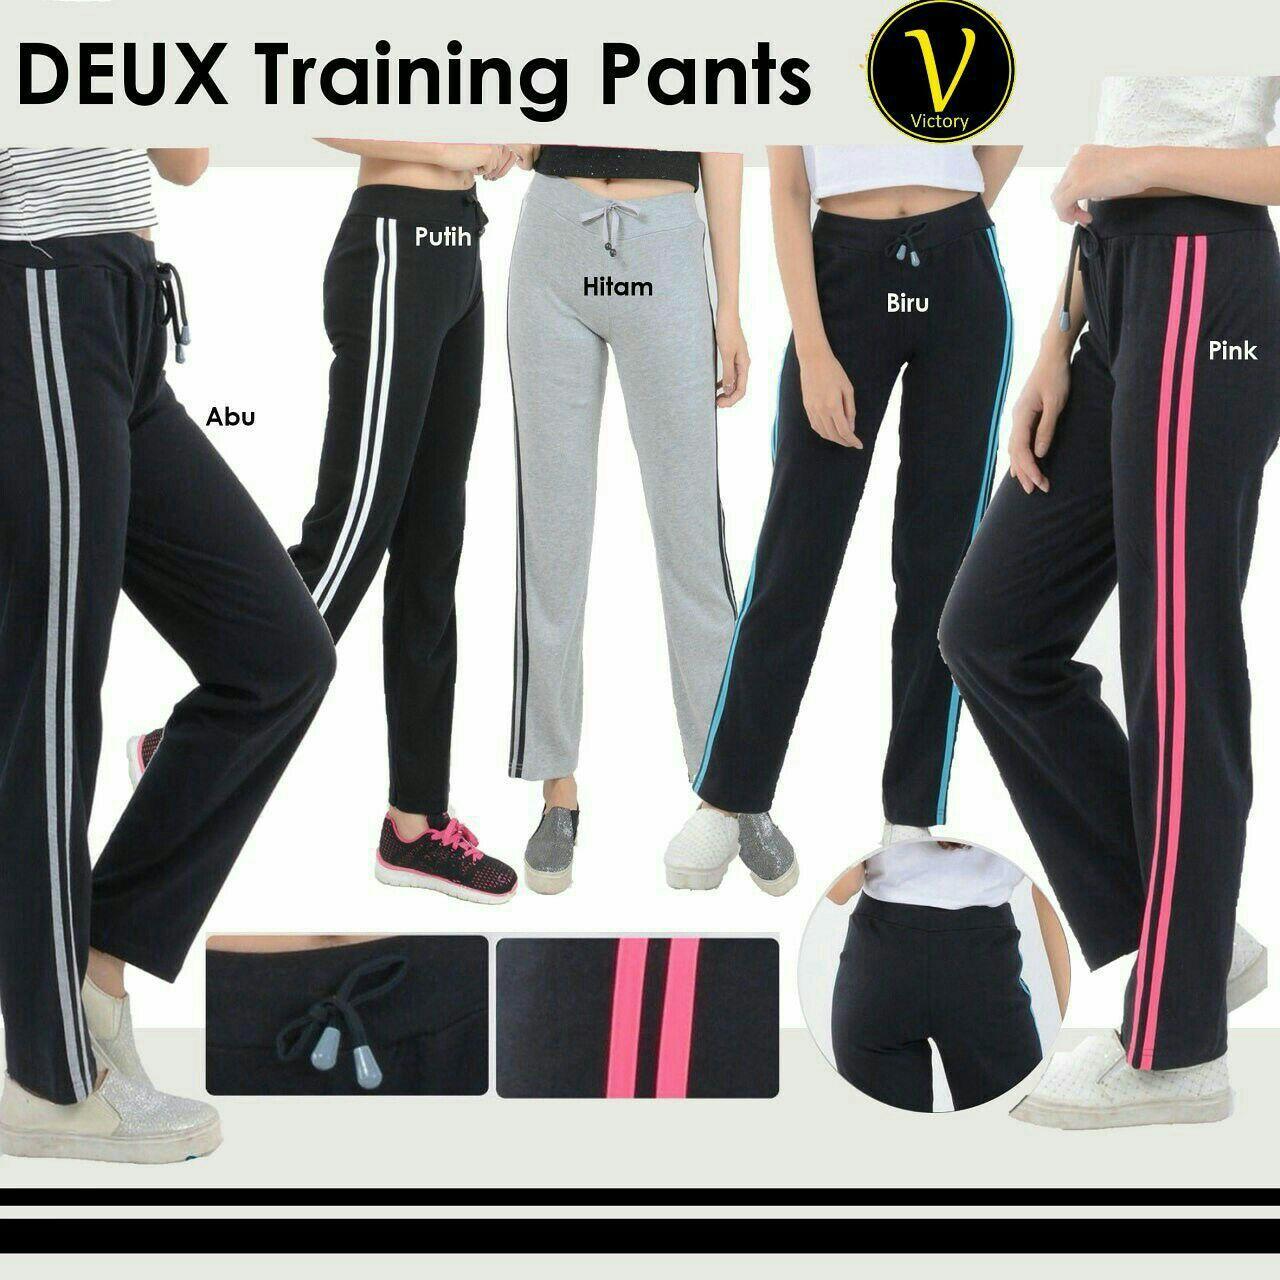 Deux Training Pants Celana Senam Celana Olahraga Celana Fitnes Celana Zumba Baju Zumba Legging Yoga Legging Aerobik